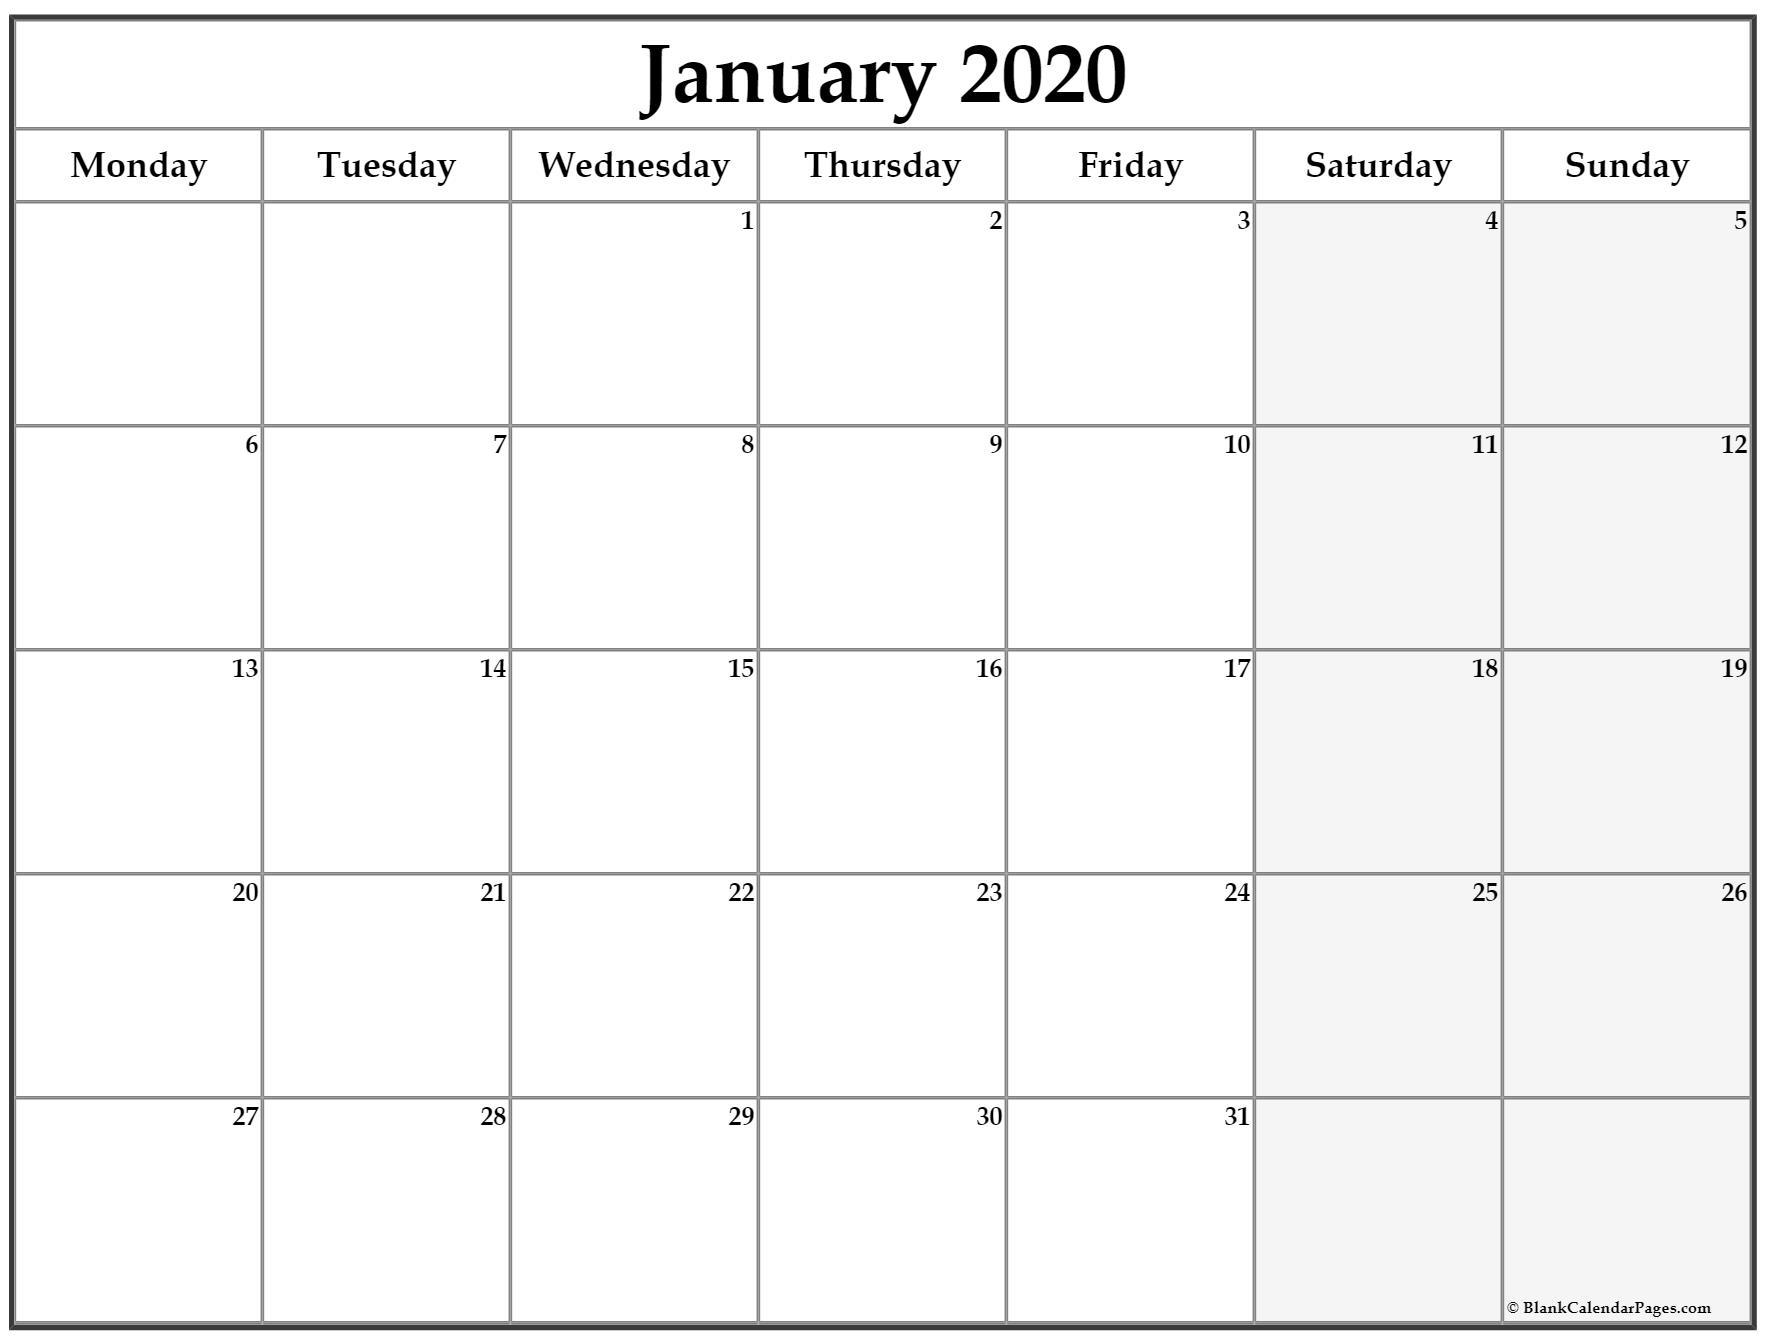 January 2020 Monday Calendar | Monday To Sunday in Calendaer 2020 Monday To Sunday